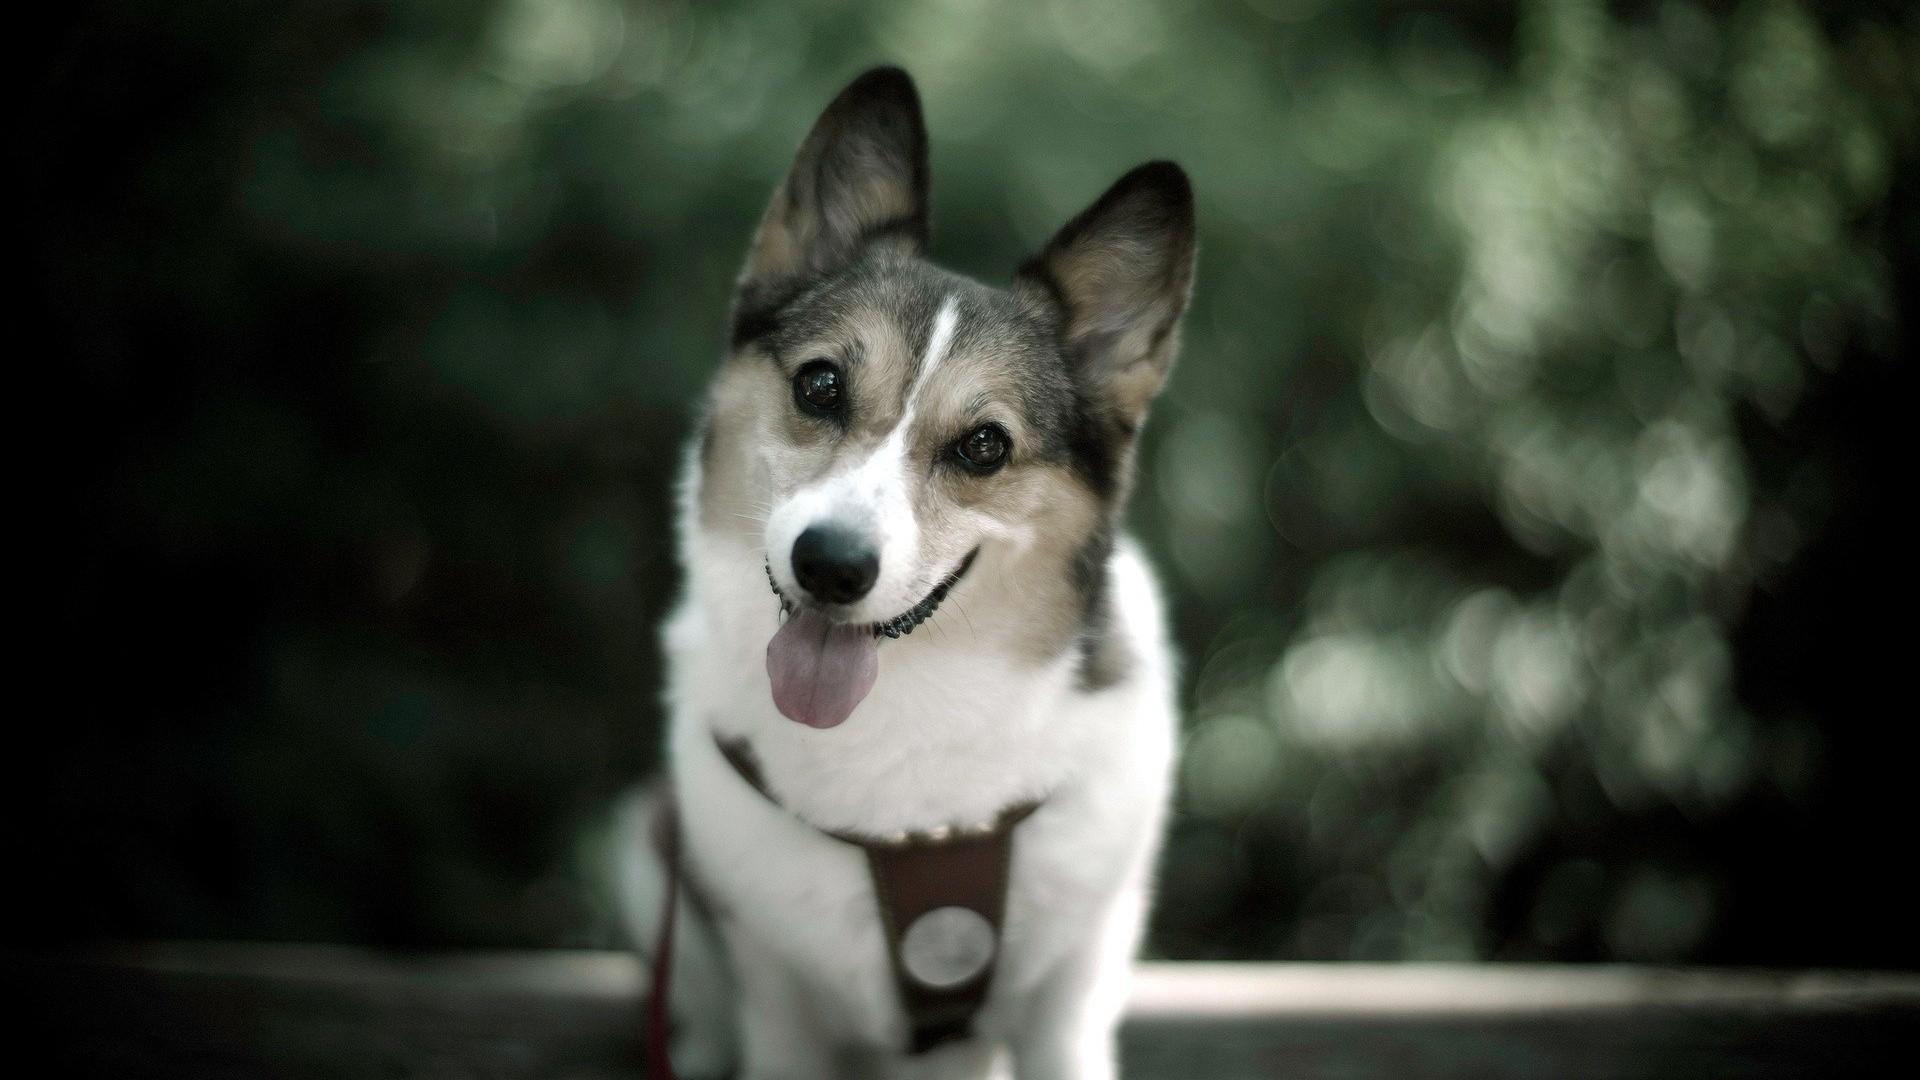 dog wallpaper hd